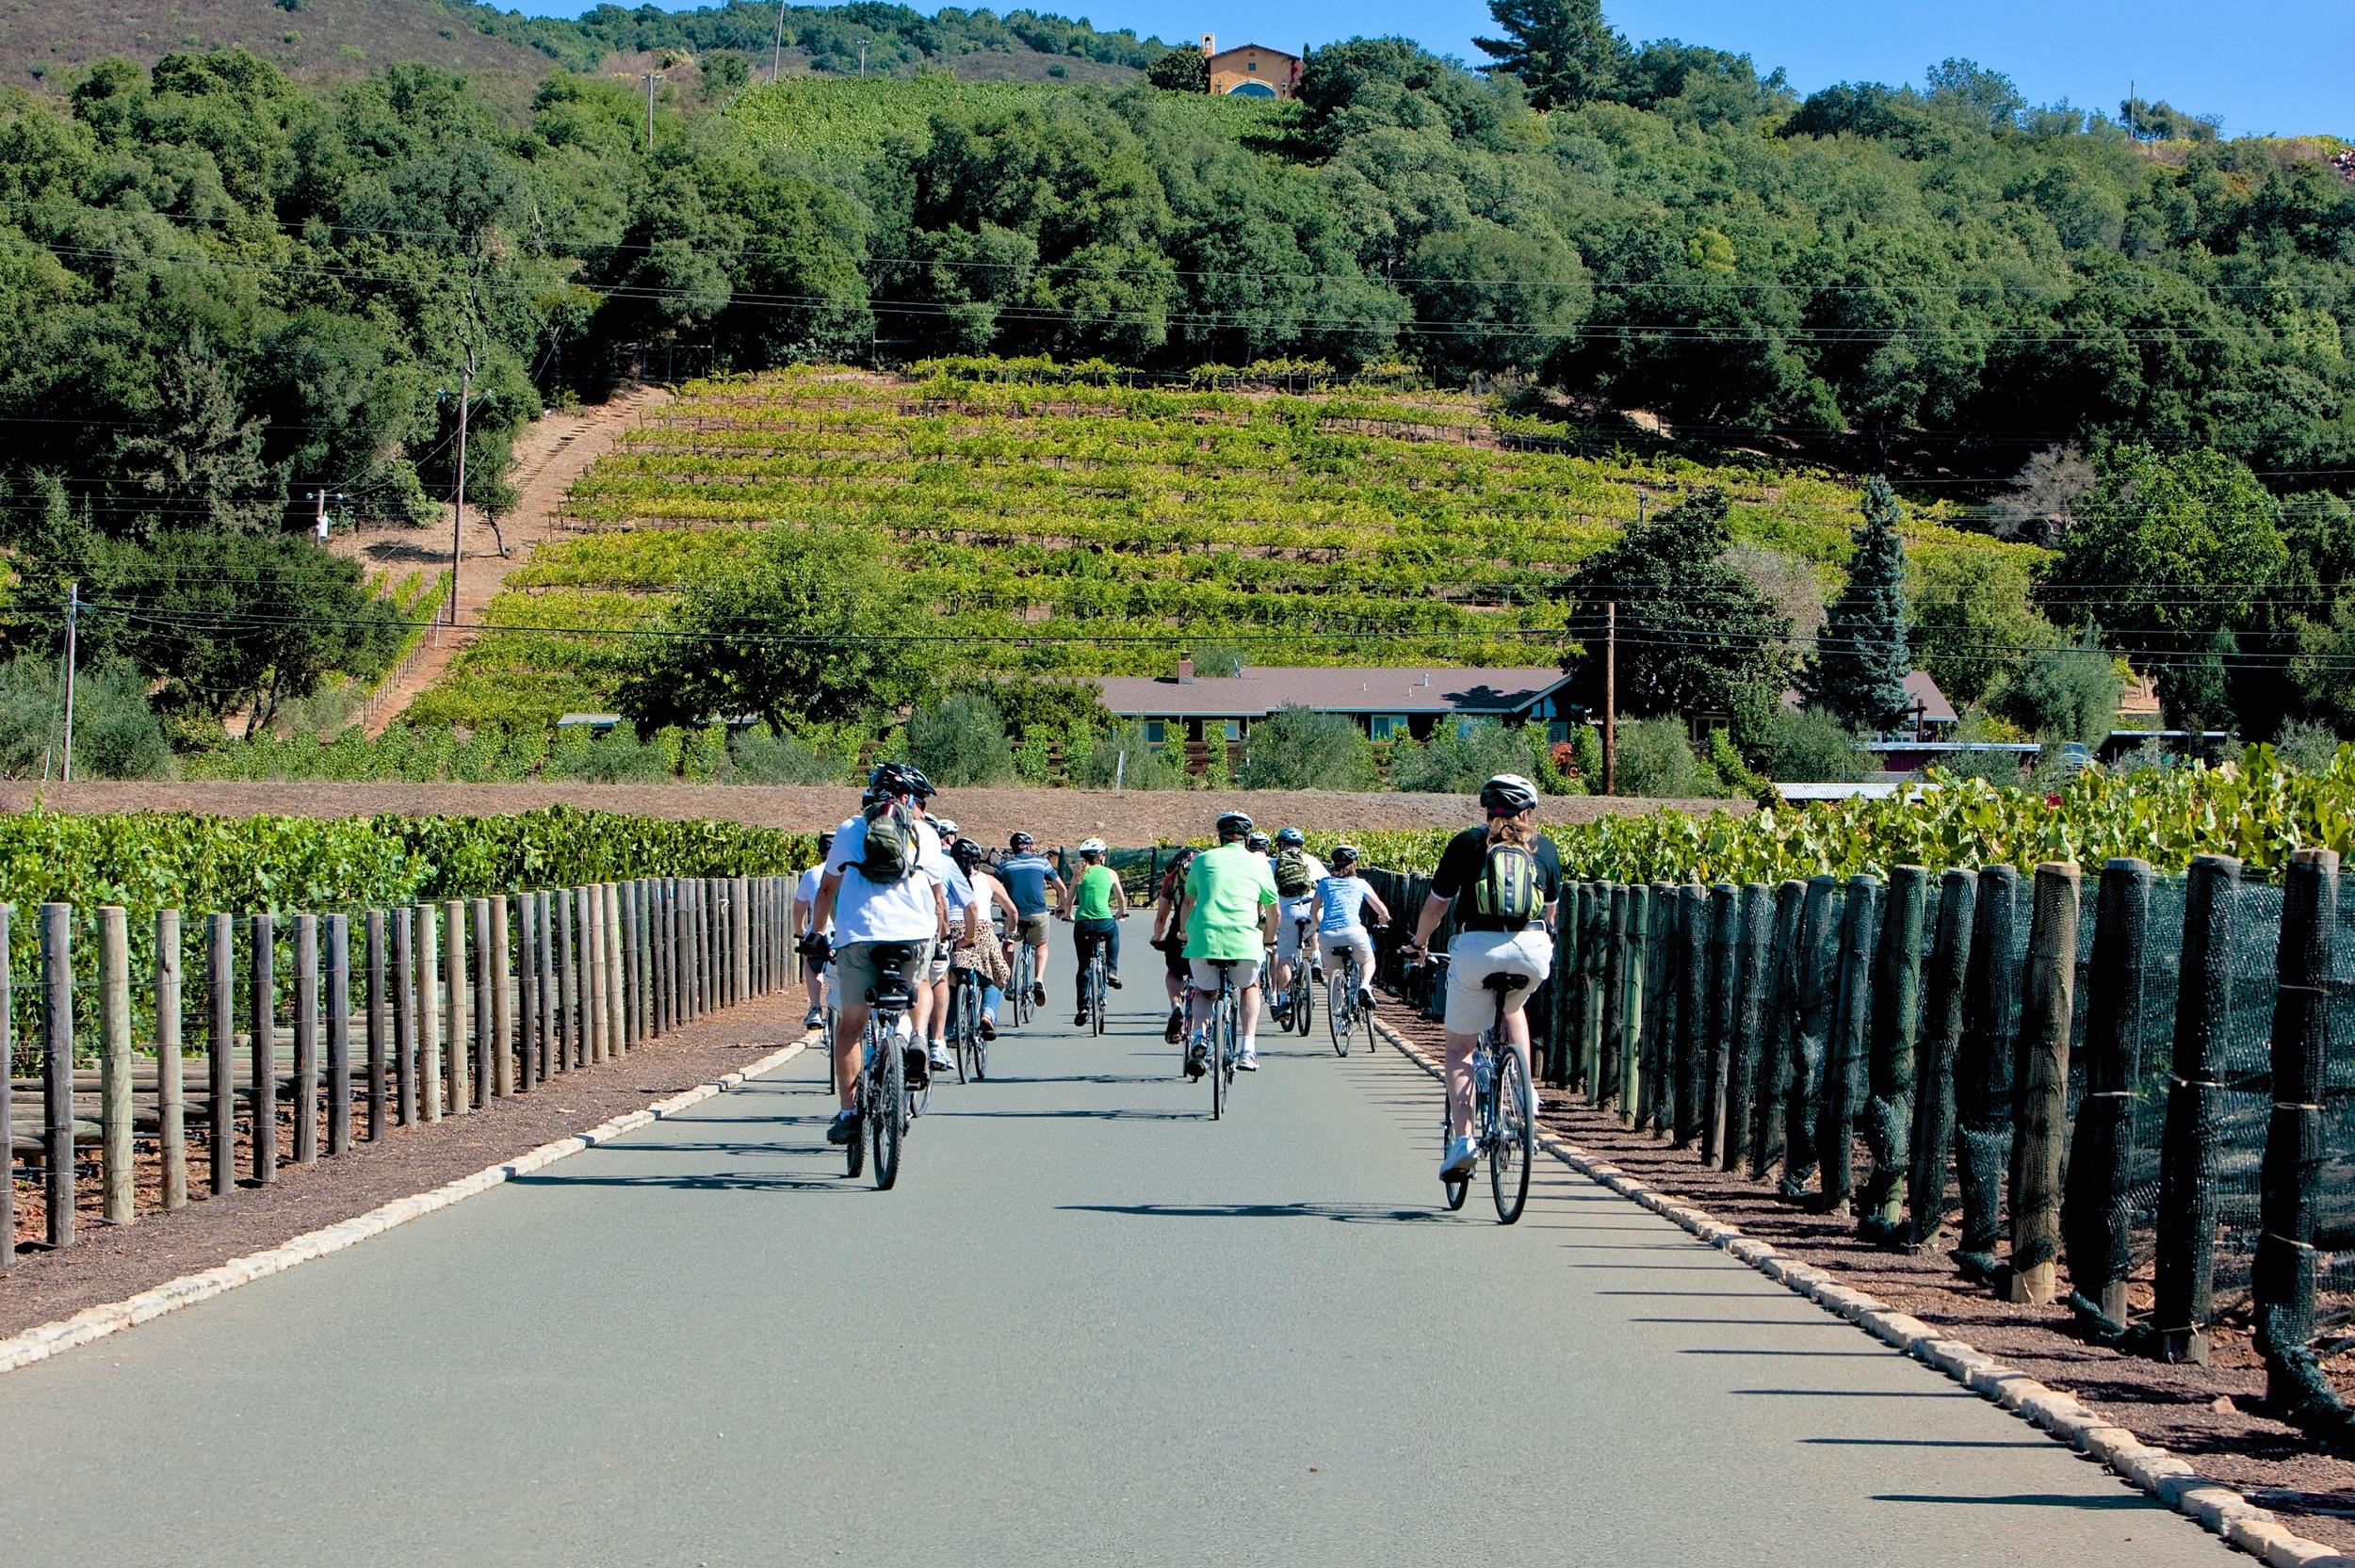 Cycling through the vineyards.